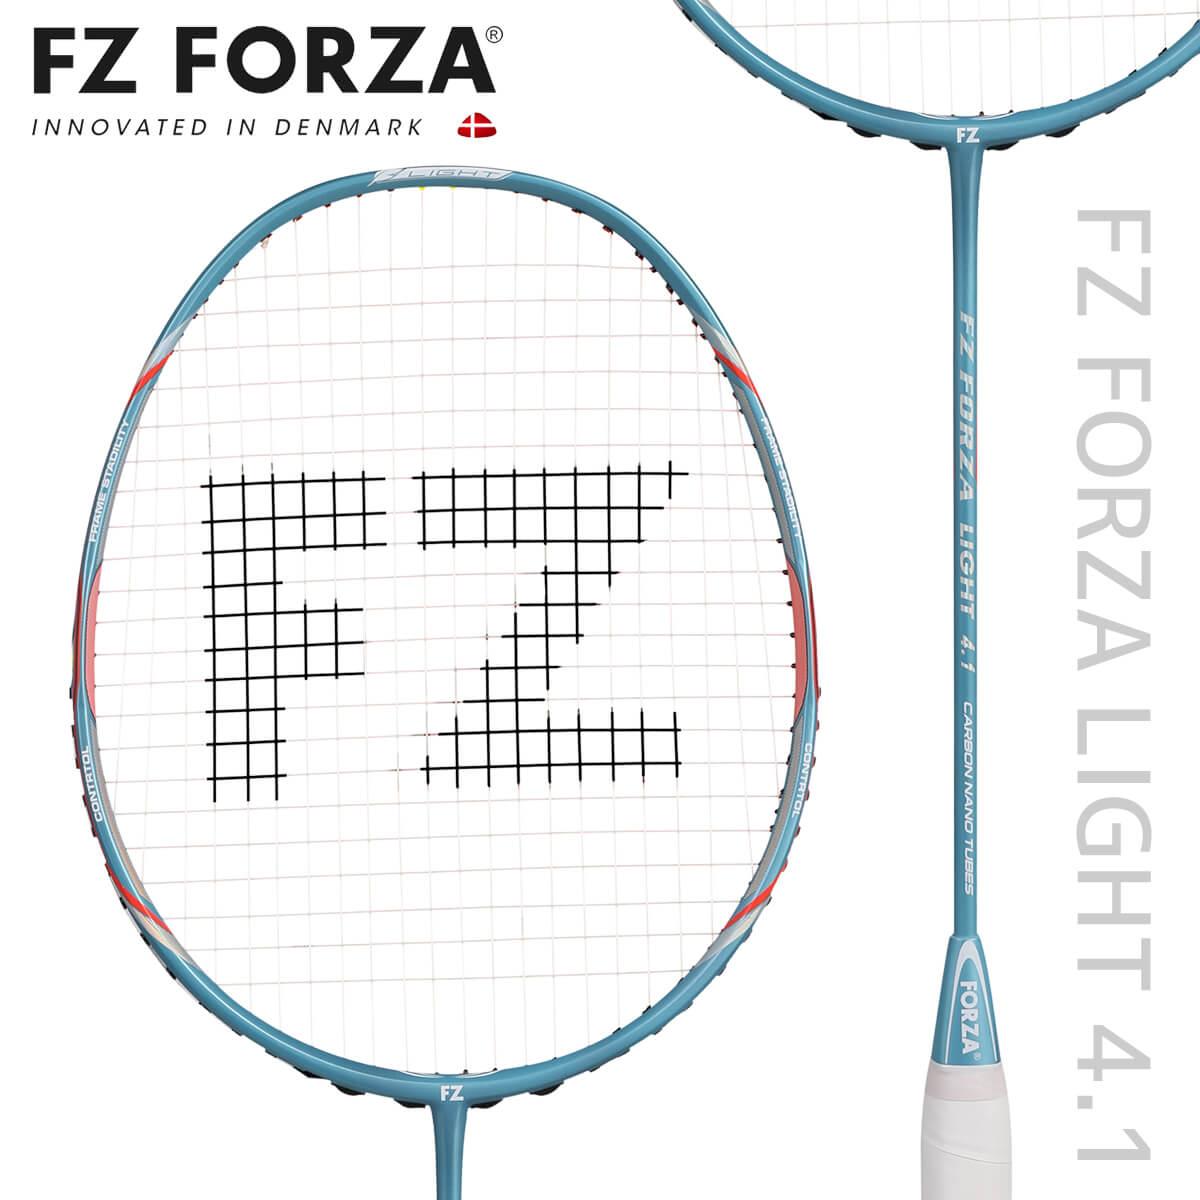 FZ FORZA LIGHT41 LIGHT 4.1 バドミントンラケット フォーザ【日本バドミントン協会審査合格品/オススメガット&ガット張り工賃無料】